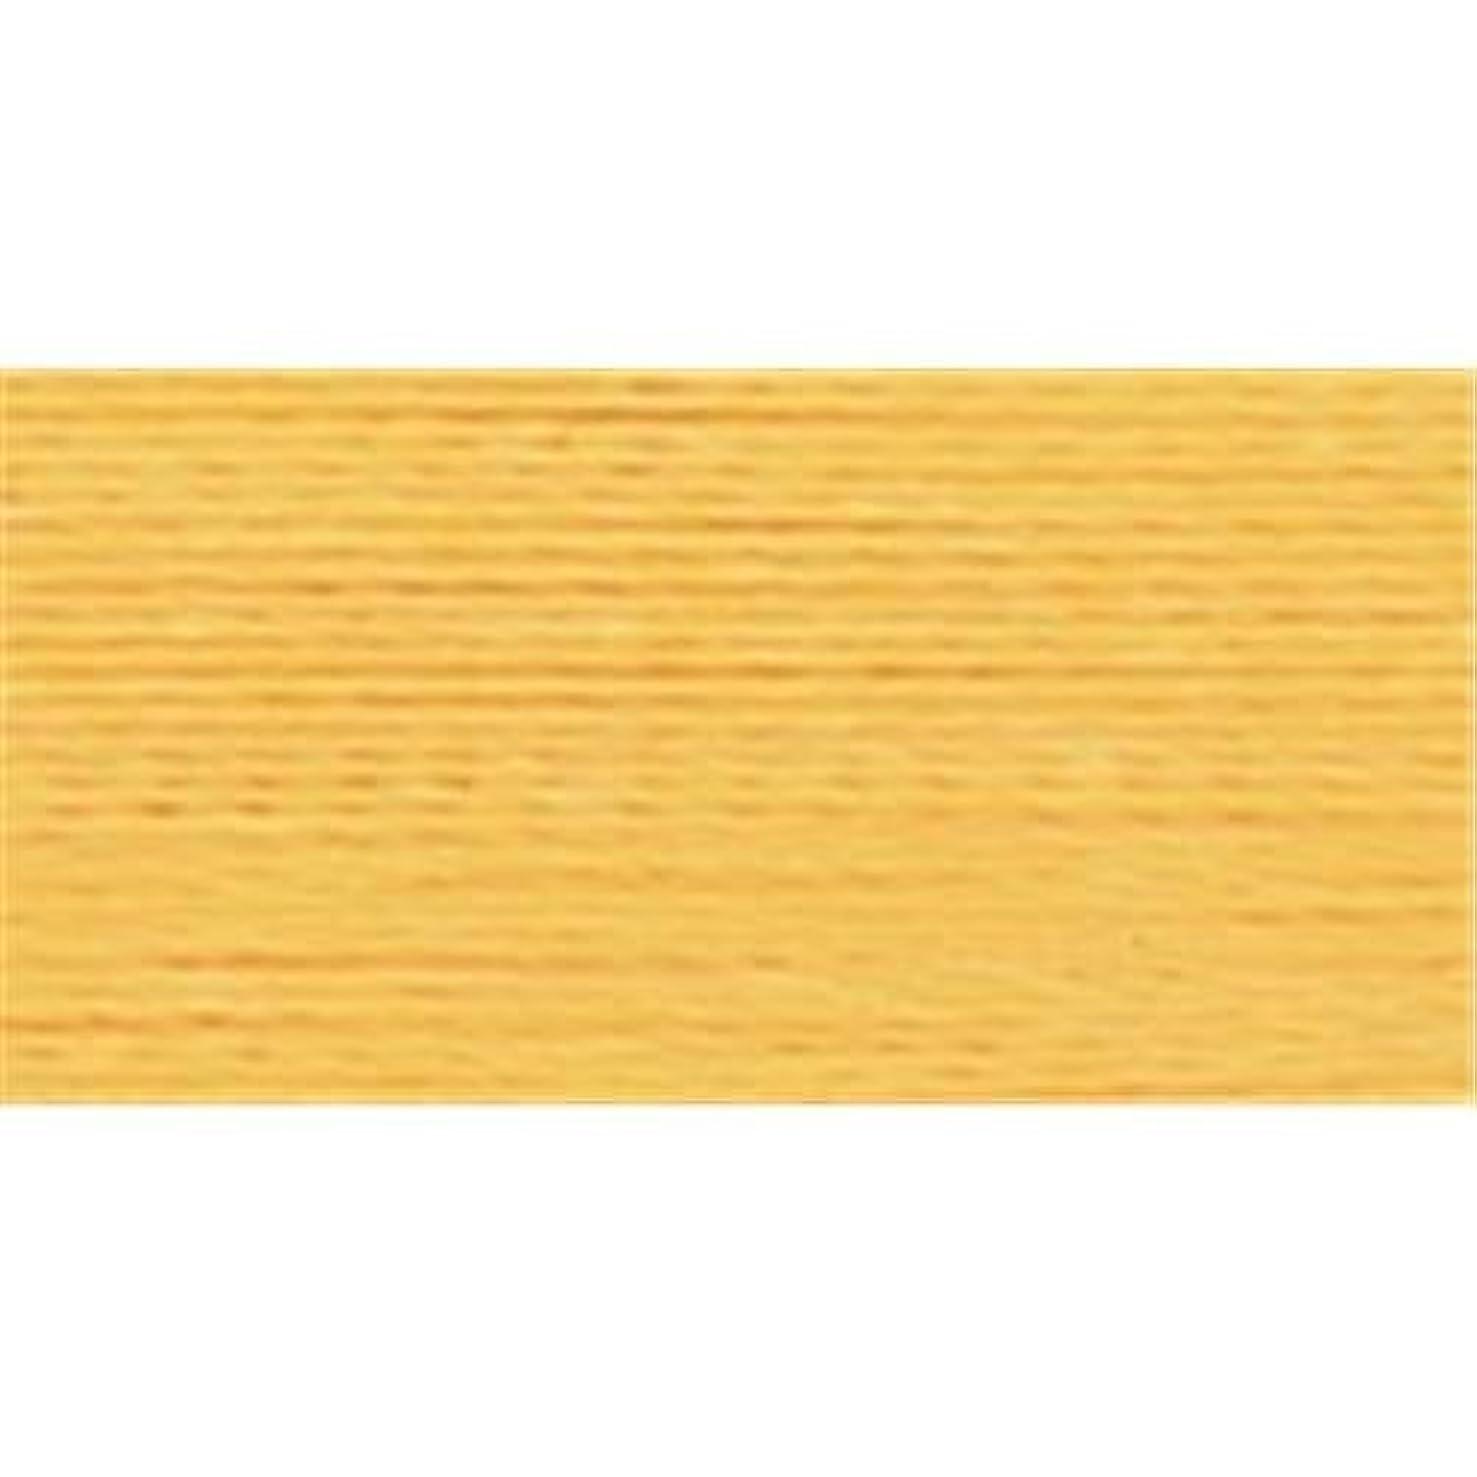 Robison-Anton Rayon Super Strength Thread, 1100-Yard, Brite Yellow